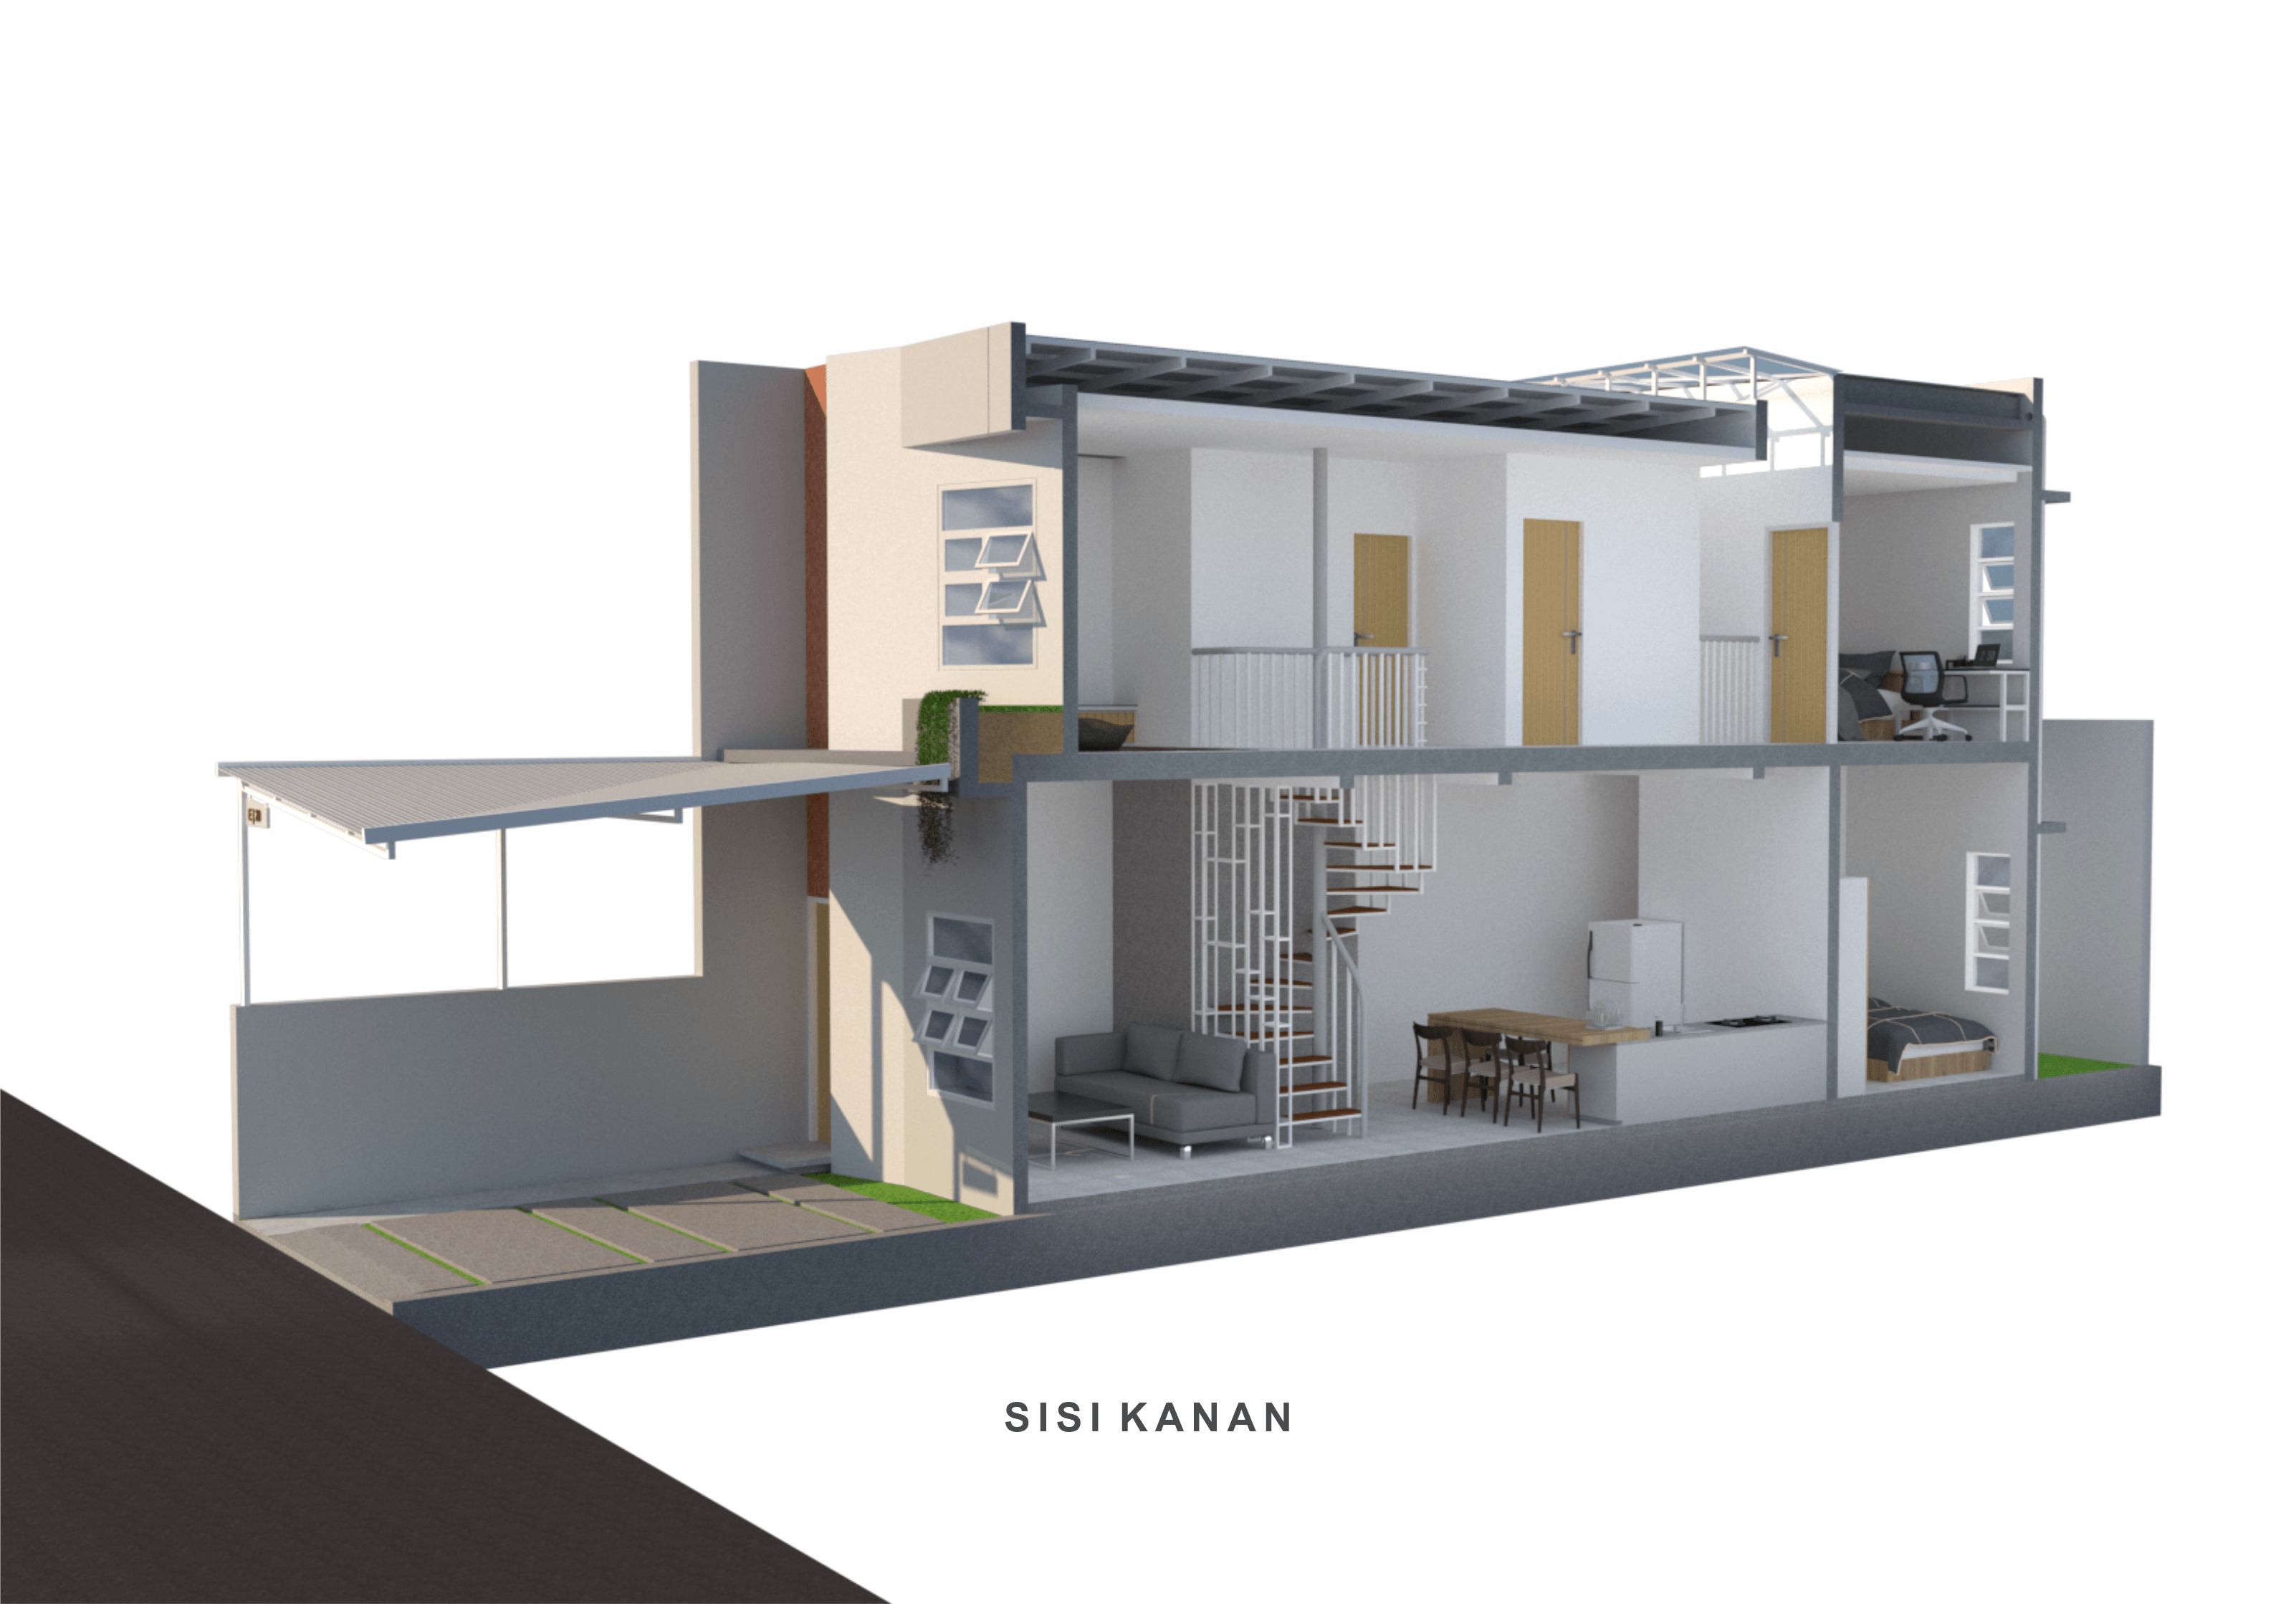 Inawa Arsitek Compact House Makassar, Kota Makassar, Sulawesi Selatan, Indonesia Makassar, Kota Makassar, Sulawesi Selatan, Indonesia Inawa-Arsitek-Compact-House   112046